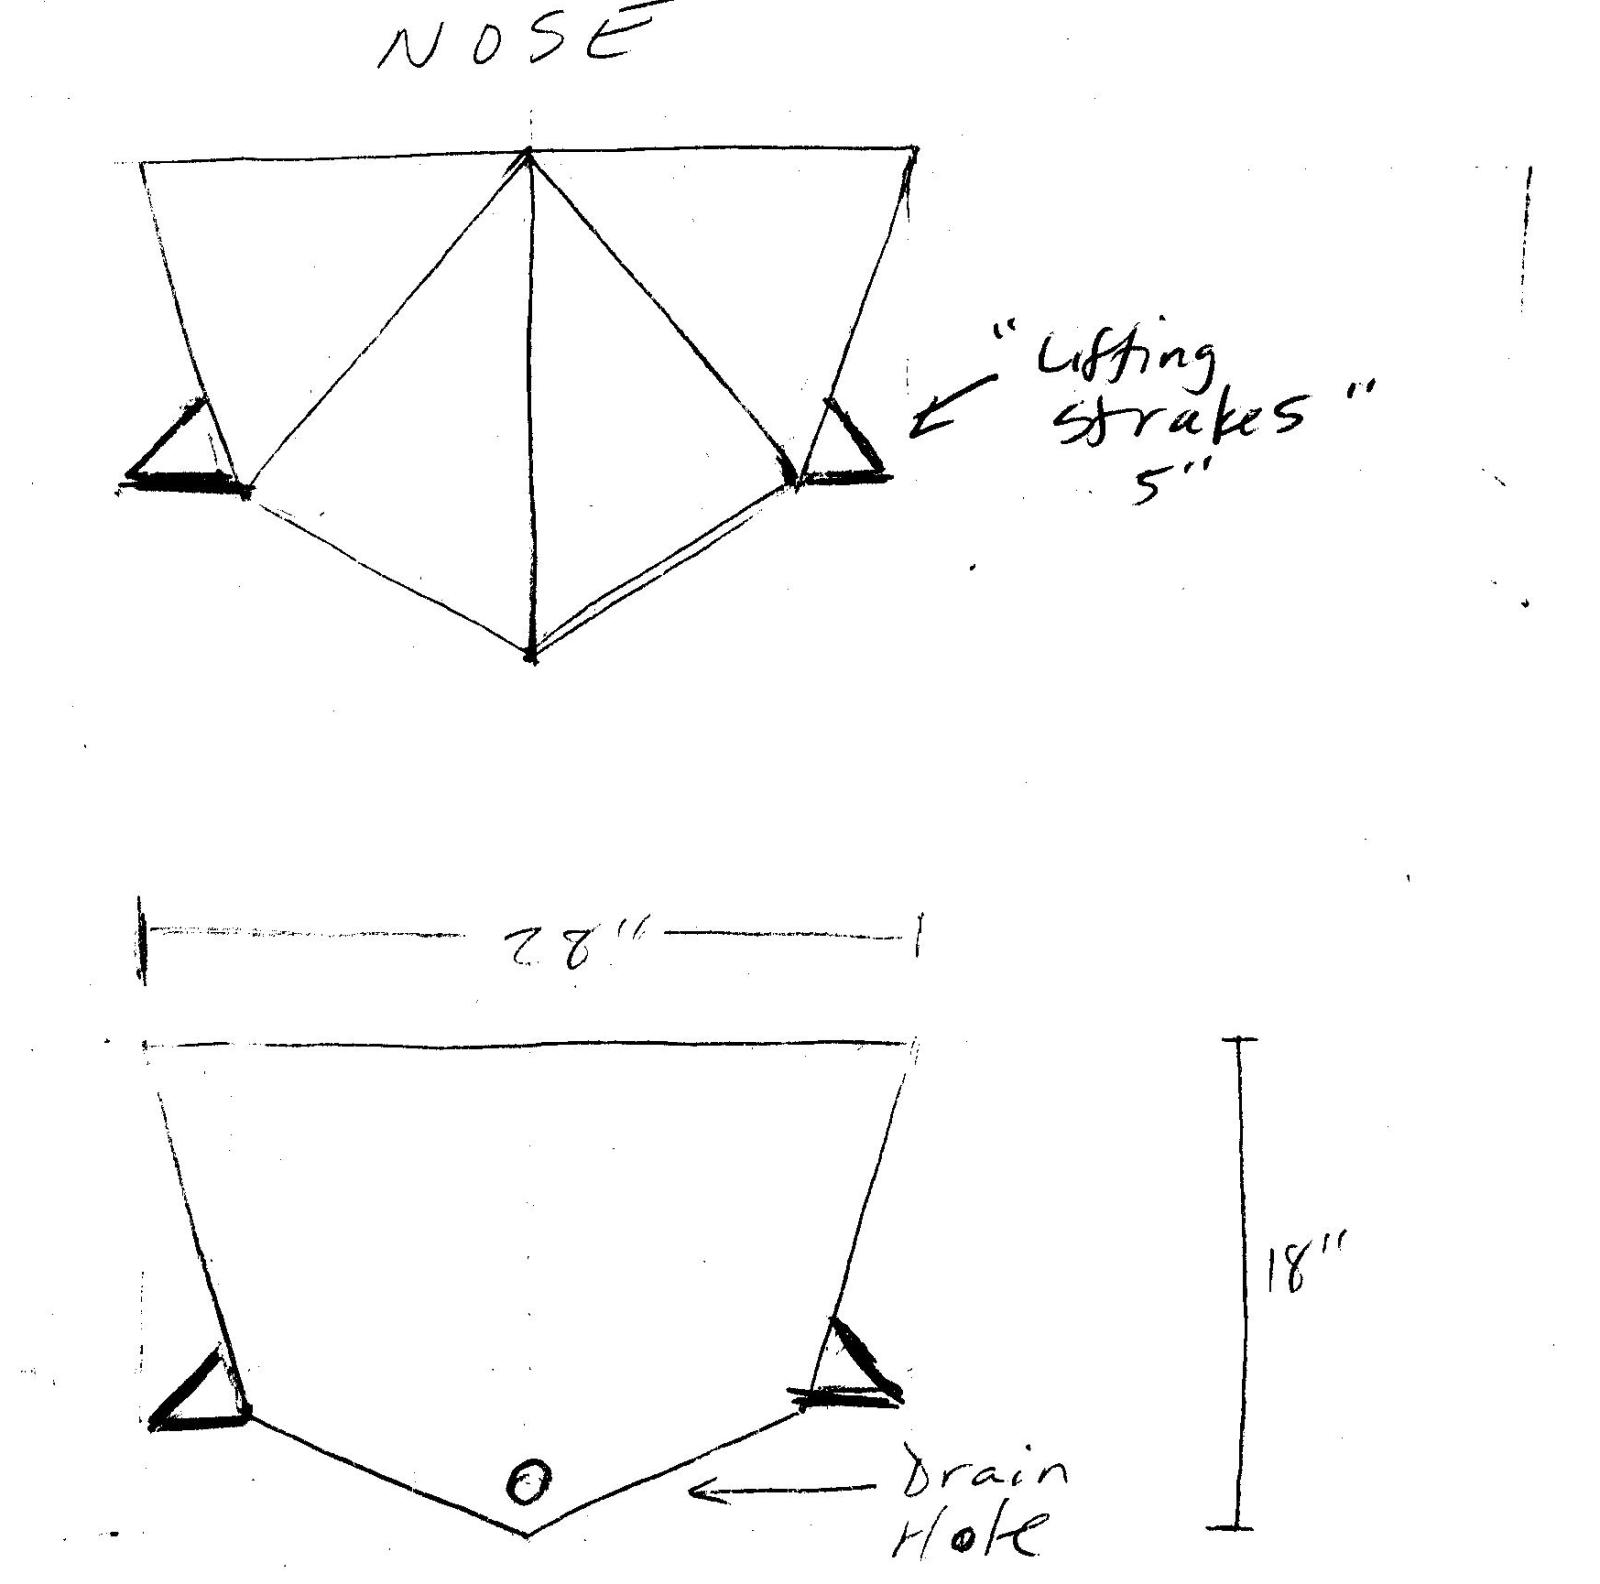 Design Ideas for Fabricating 3rd Pontoon | Boat Design Net